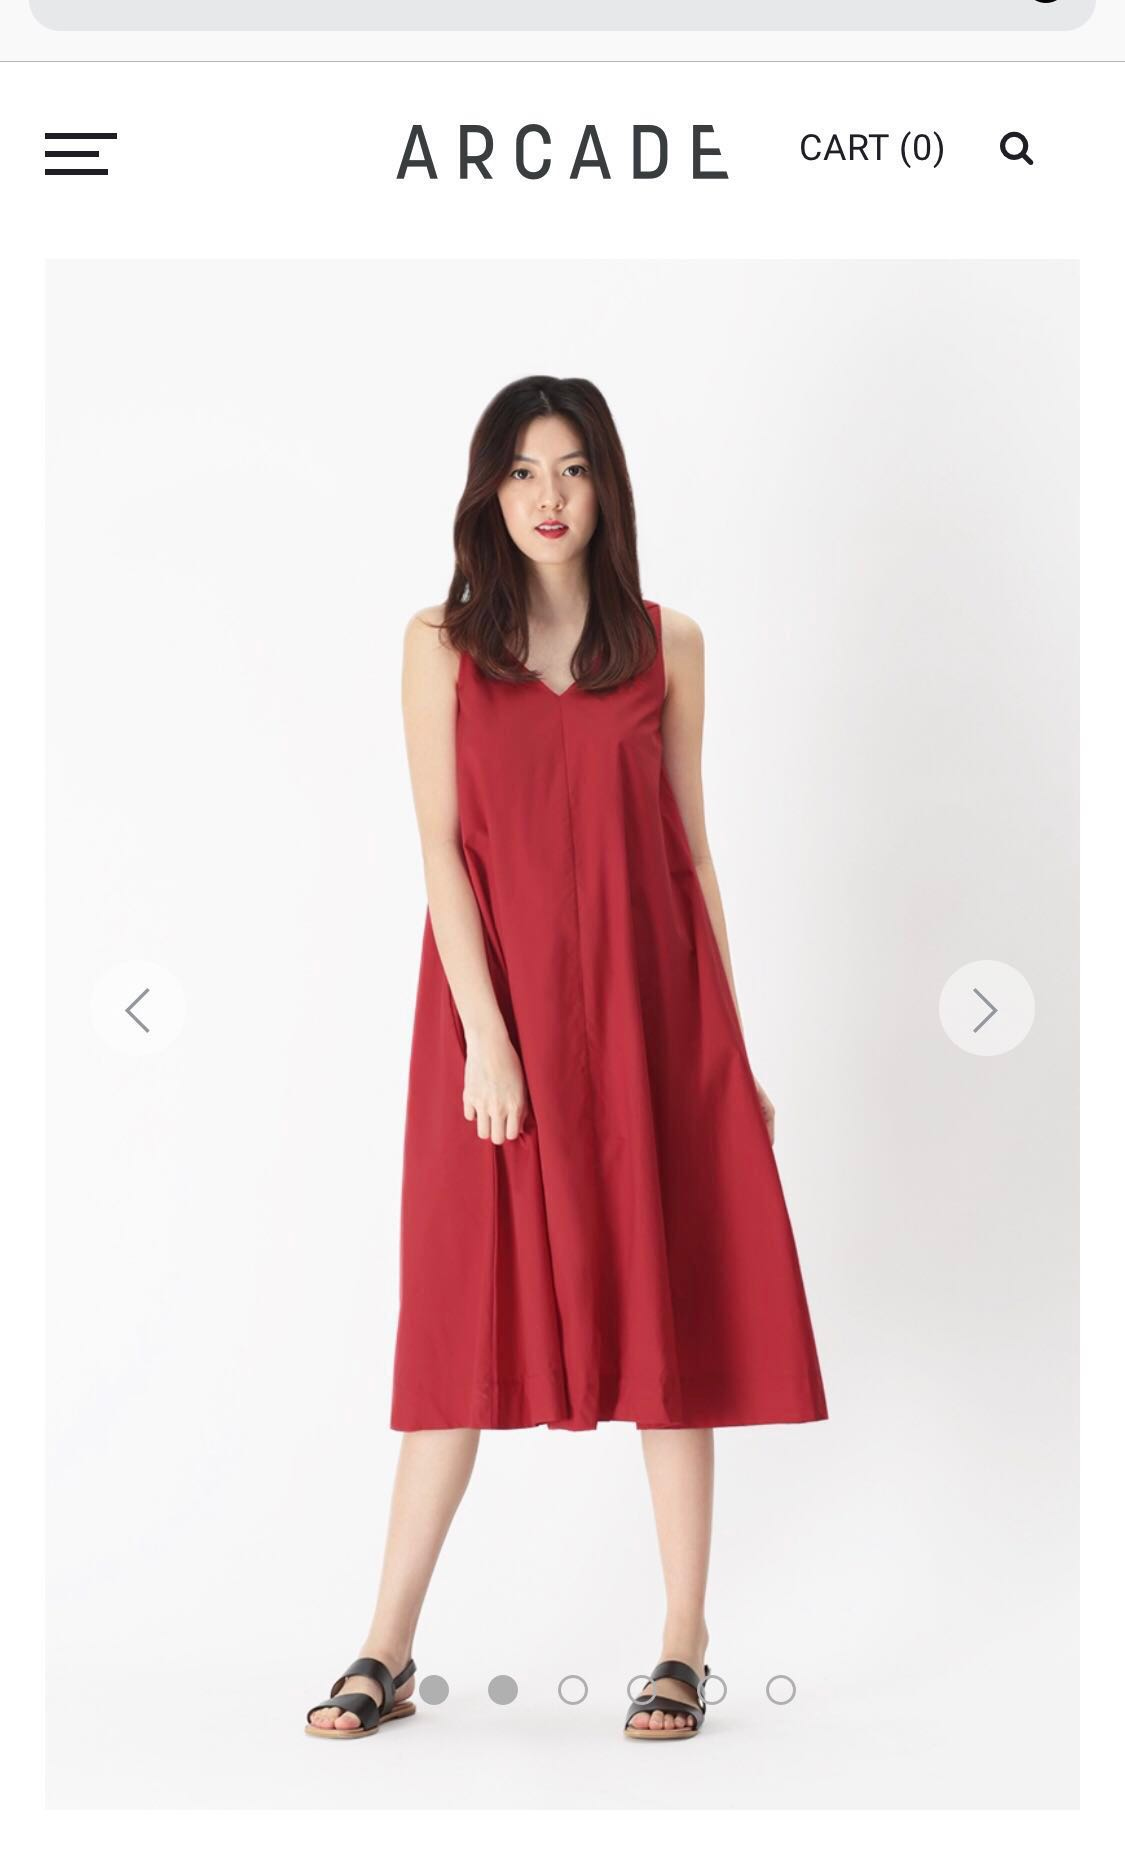 e271774fd2f79d AFA WILLOW V-NECK FLARE DRESS IN AURORA RED, Women's Fashion ...